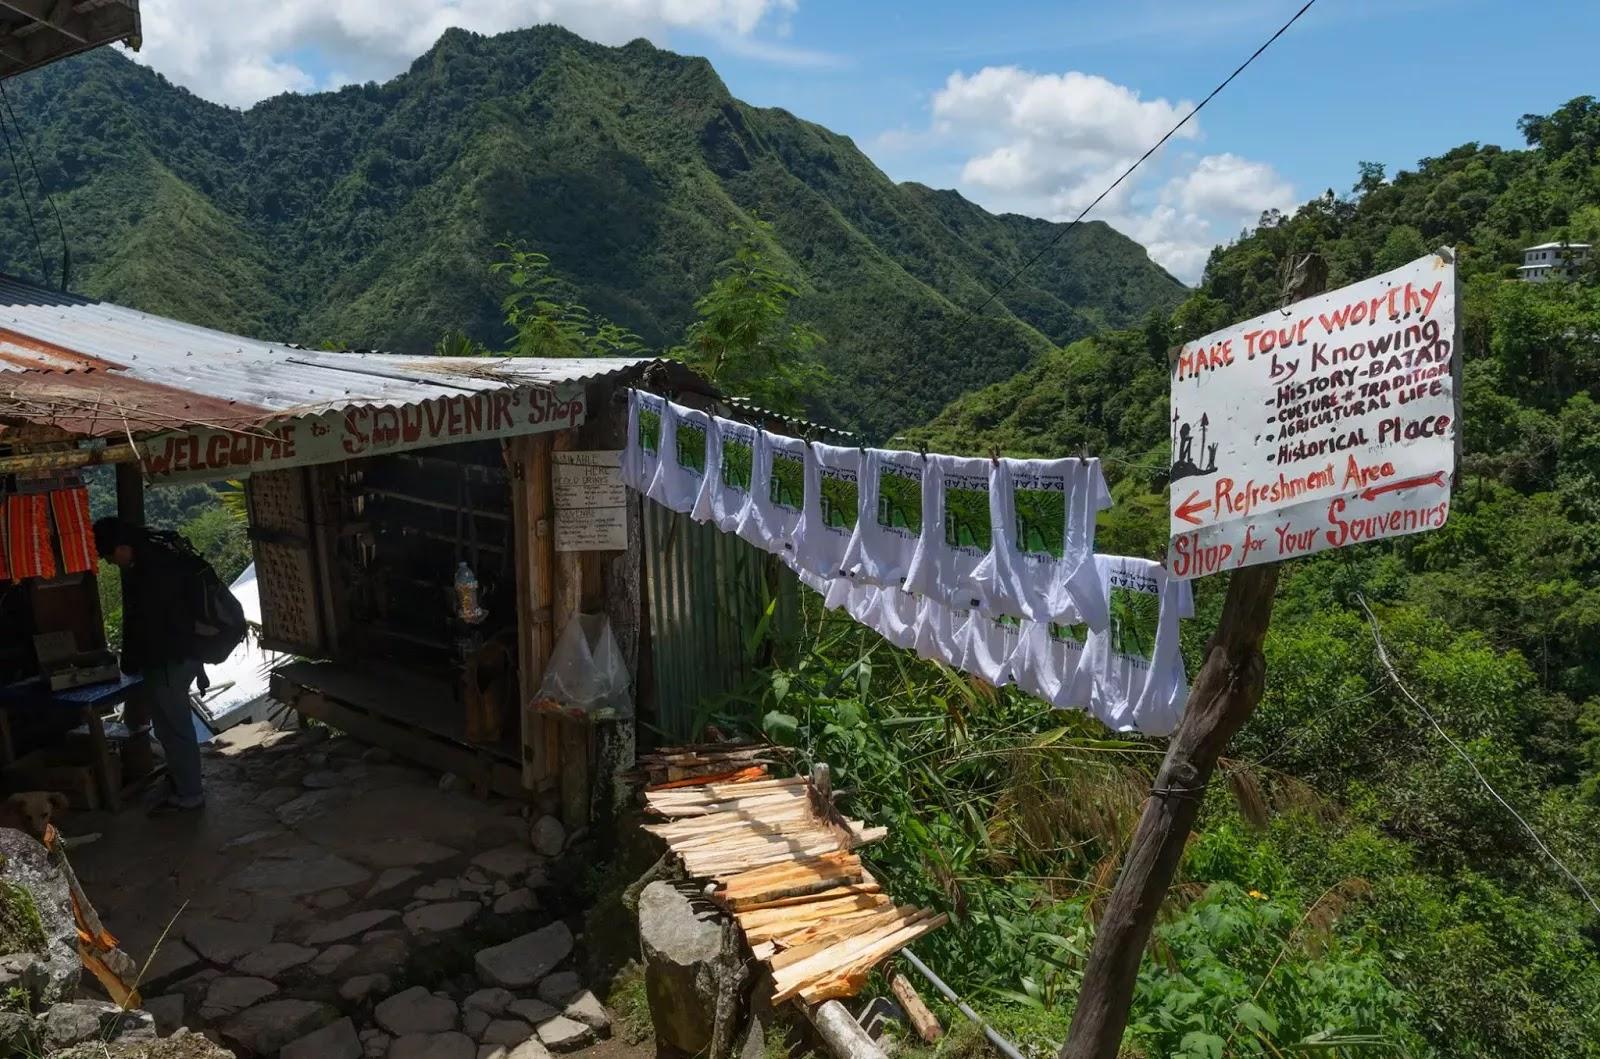 Souvenir  Shop Shed Batad Ifugao Cordillera Administrative Region Philippines